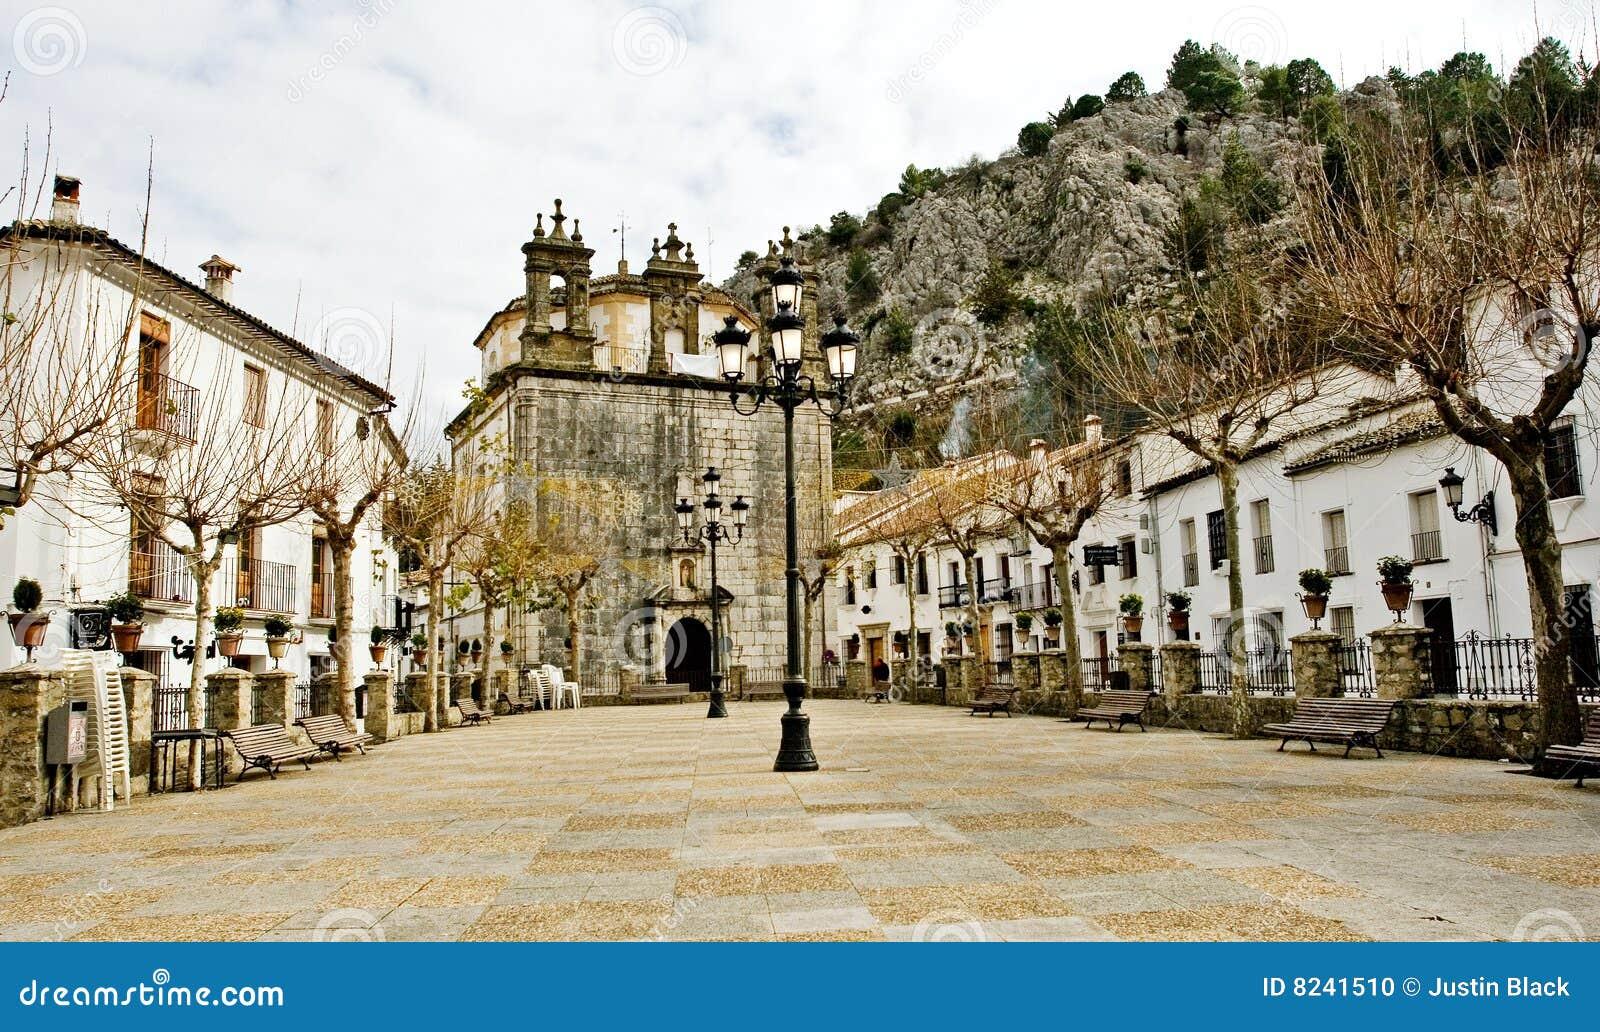 Grazalema Spain  city images : Small Village Of Grazalema, Spain Stock Photo Image: 8241510